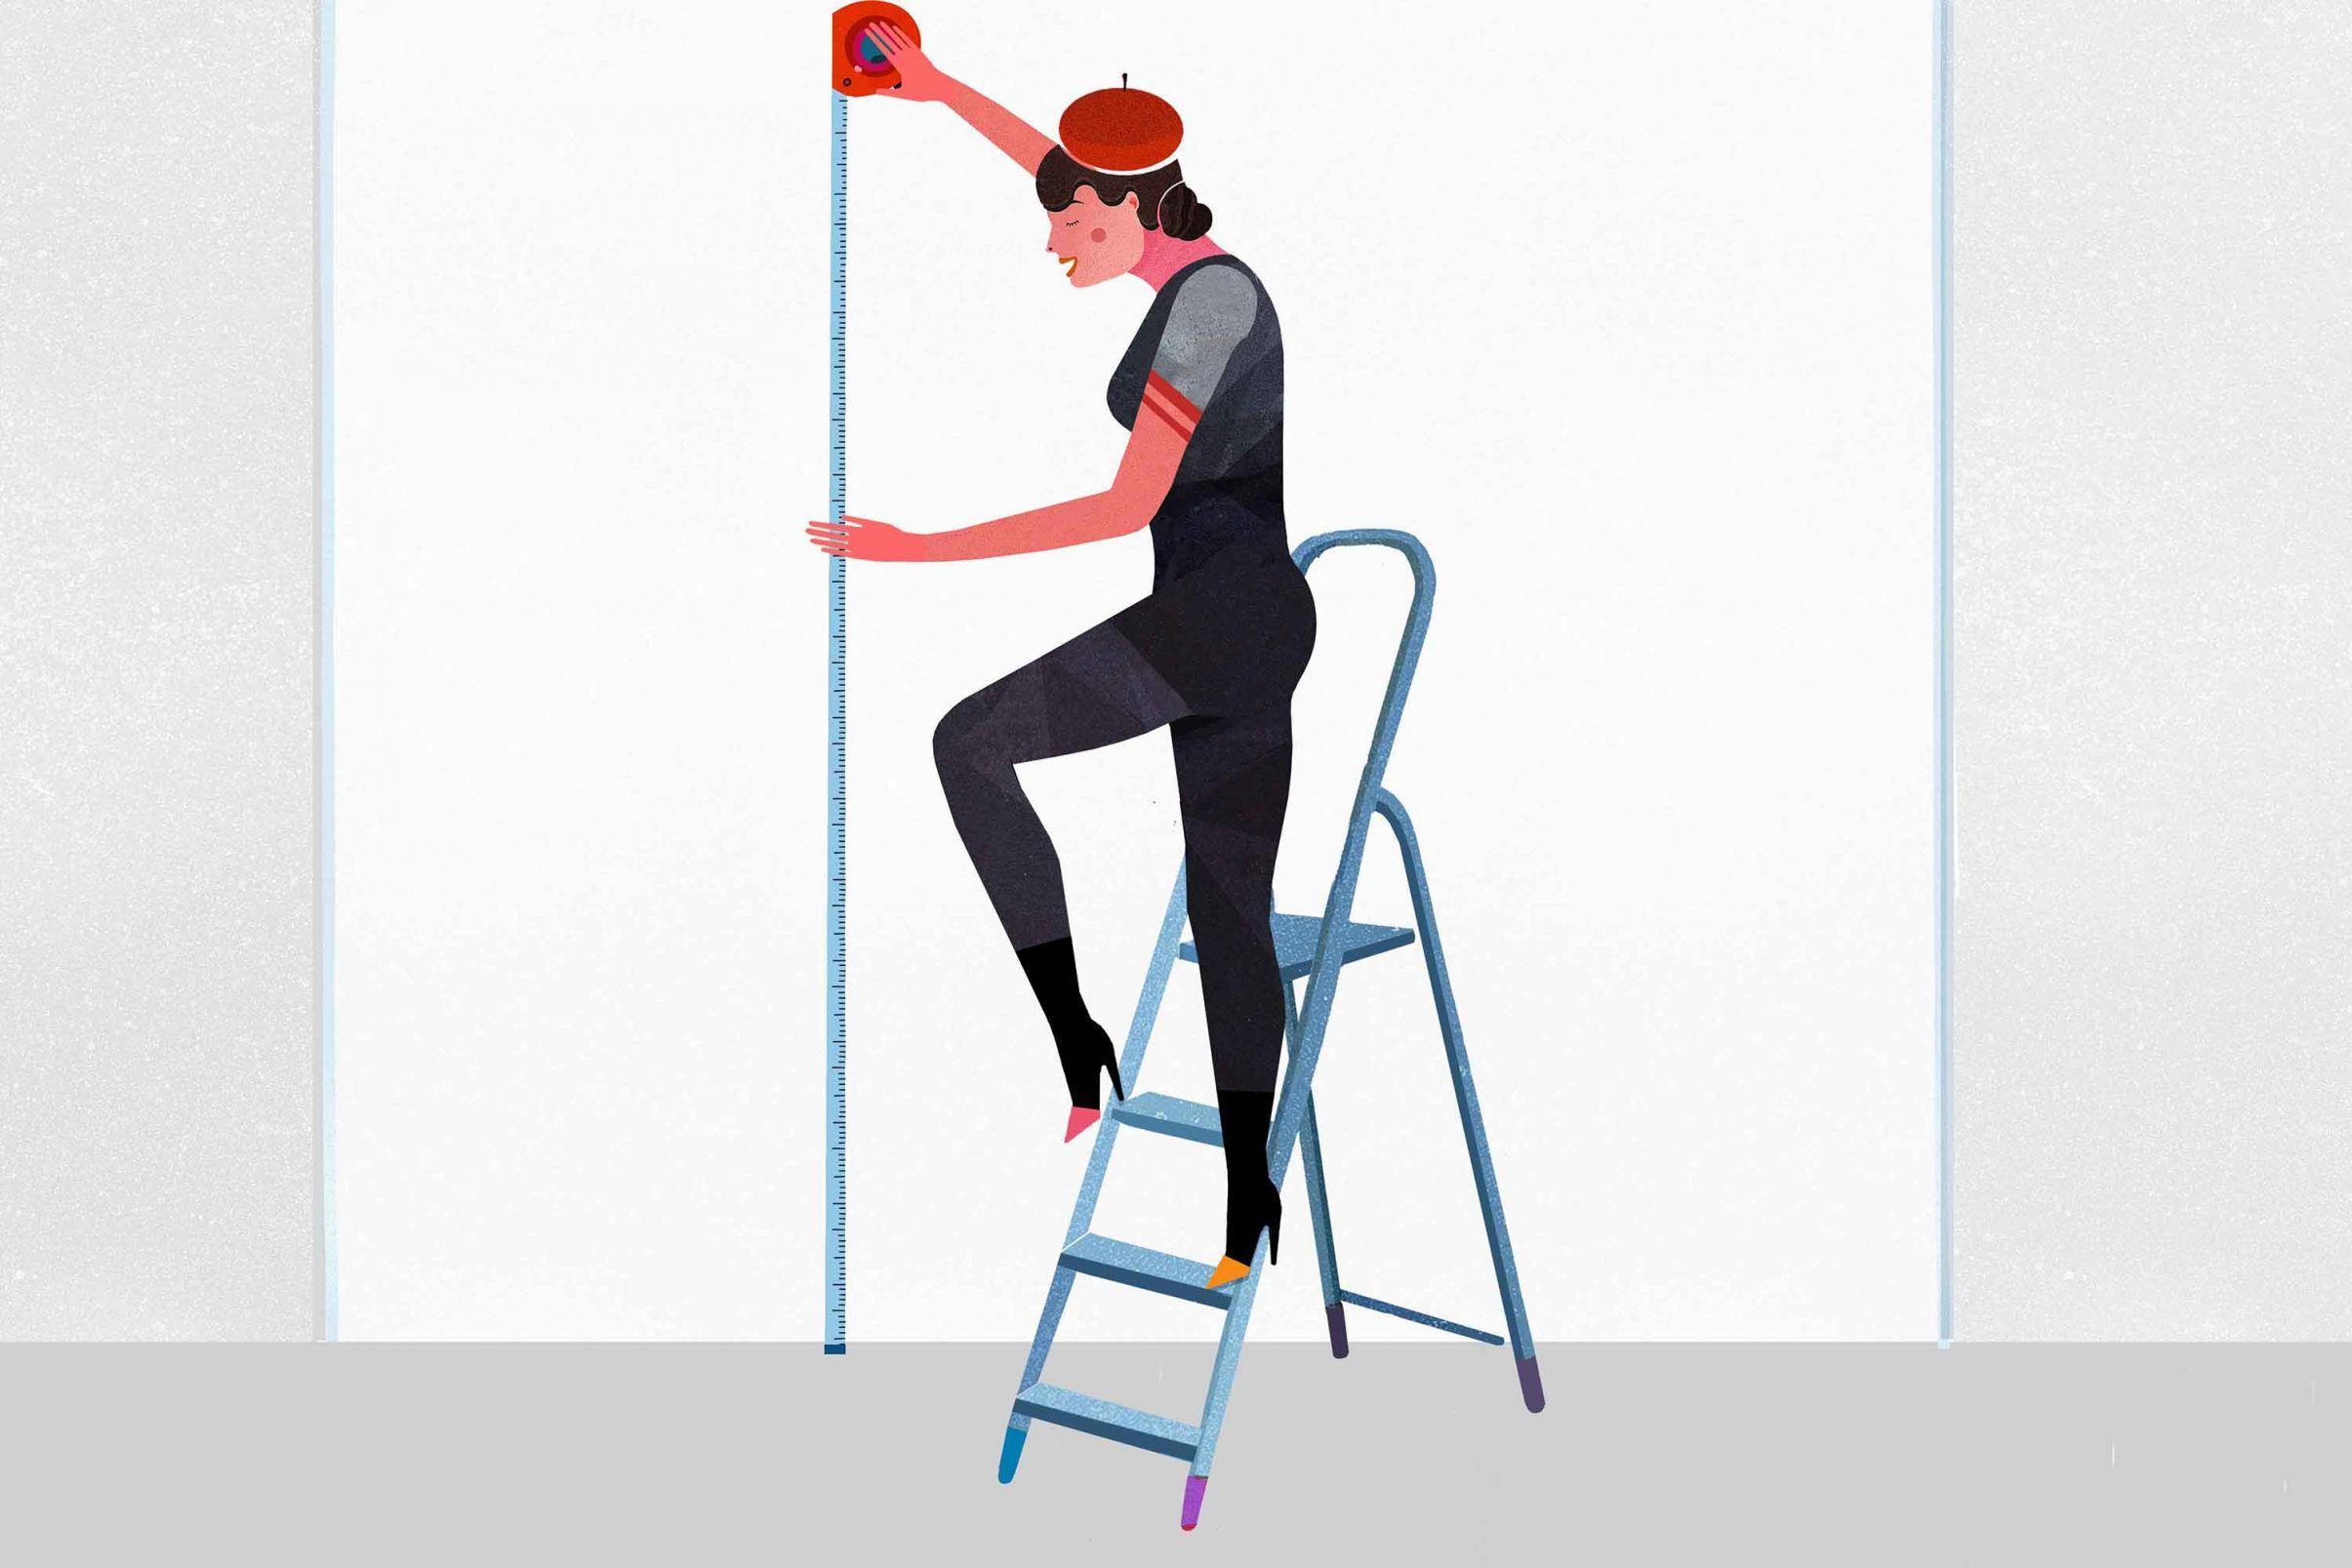 Como-cortar-papel-de-parede-corretamente-Medir-a-parede